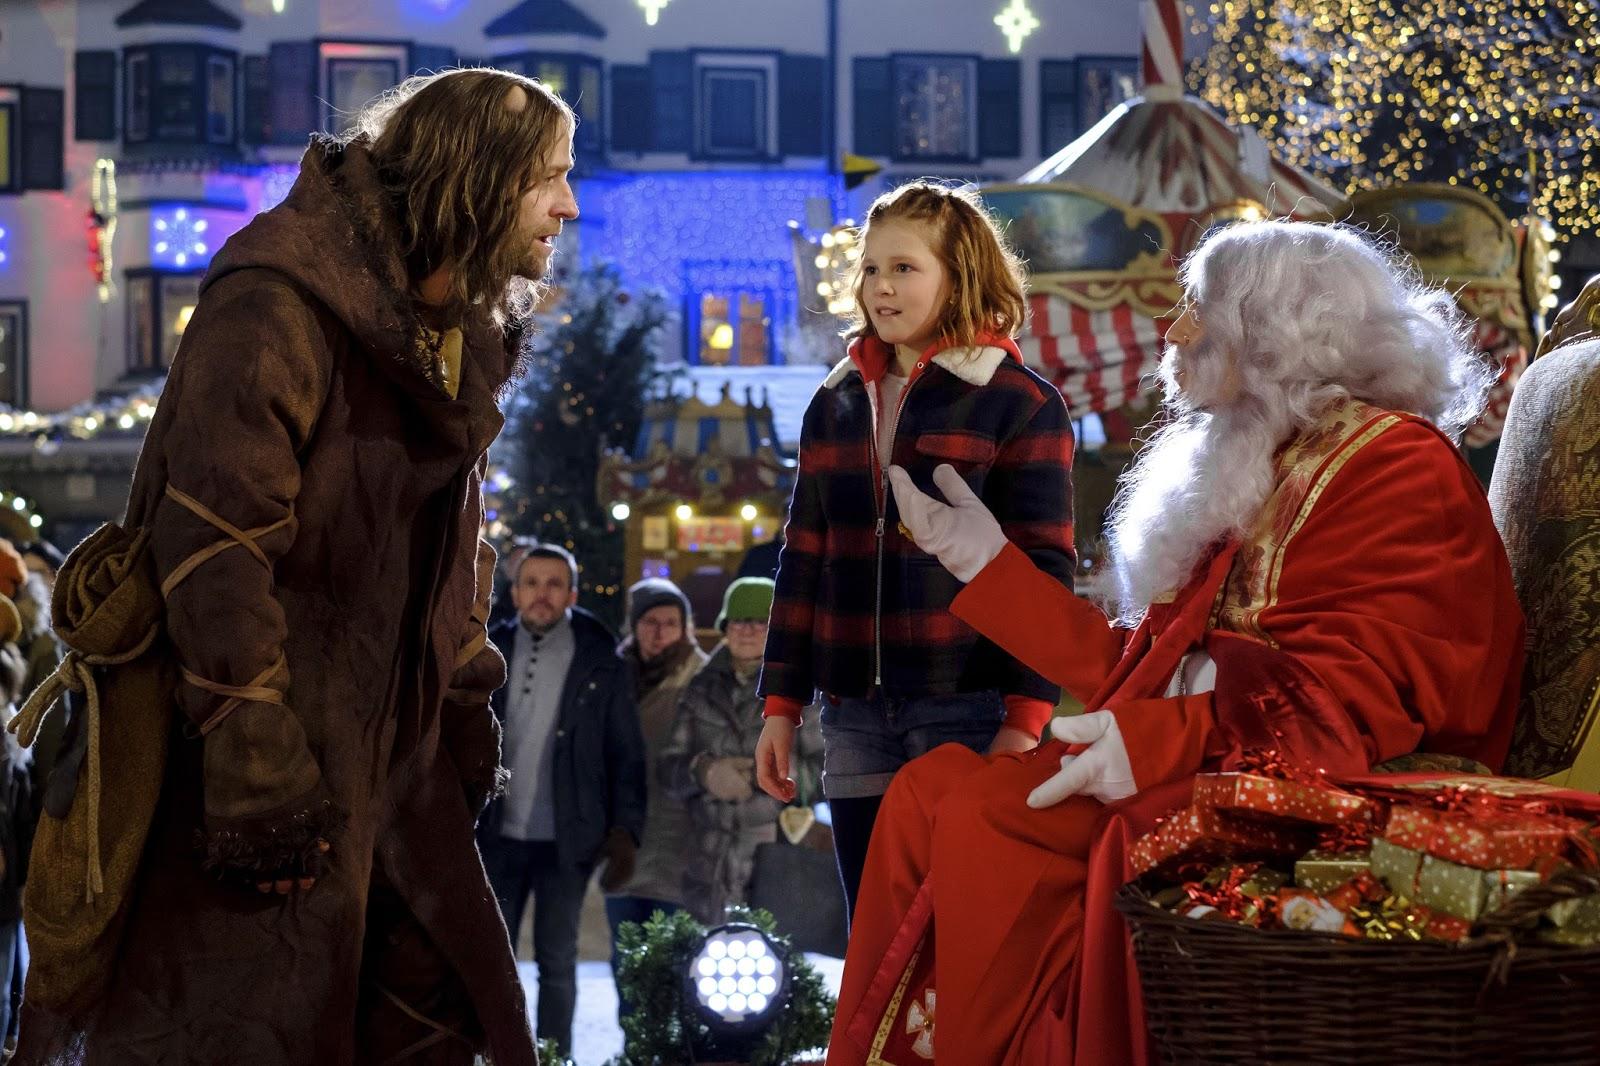 Crazy4film Hexe Lilli Rettet Weihnachten Filmbesprechung